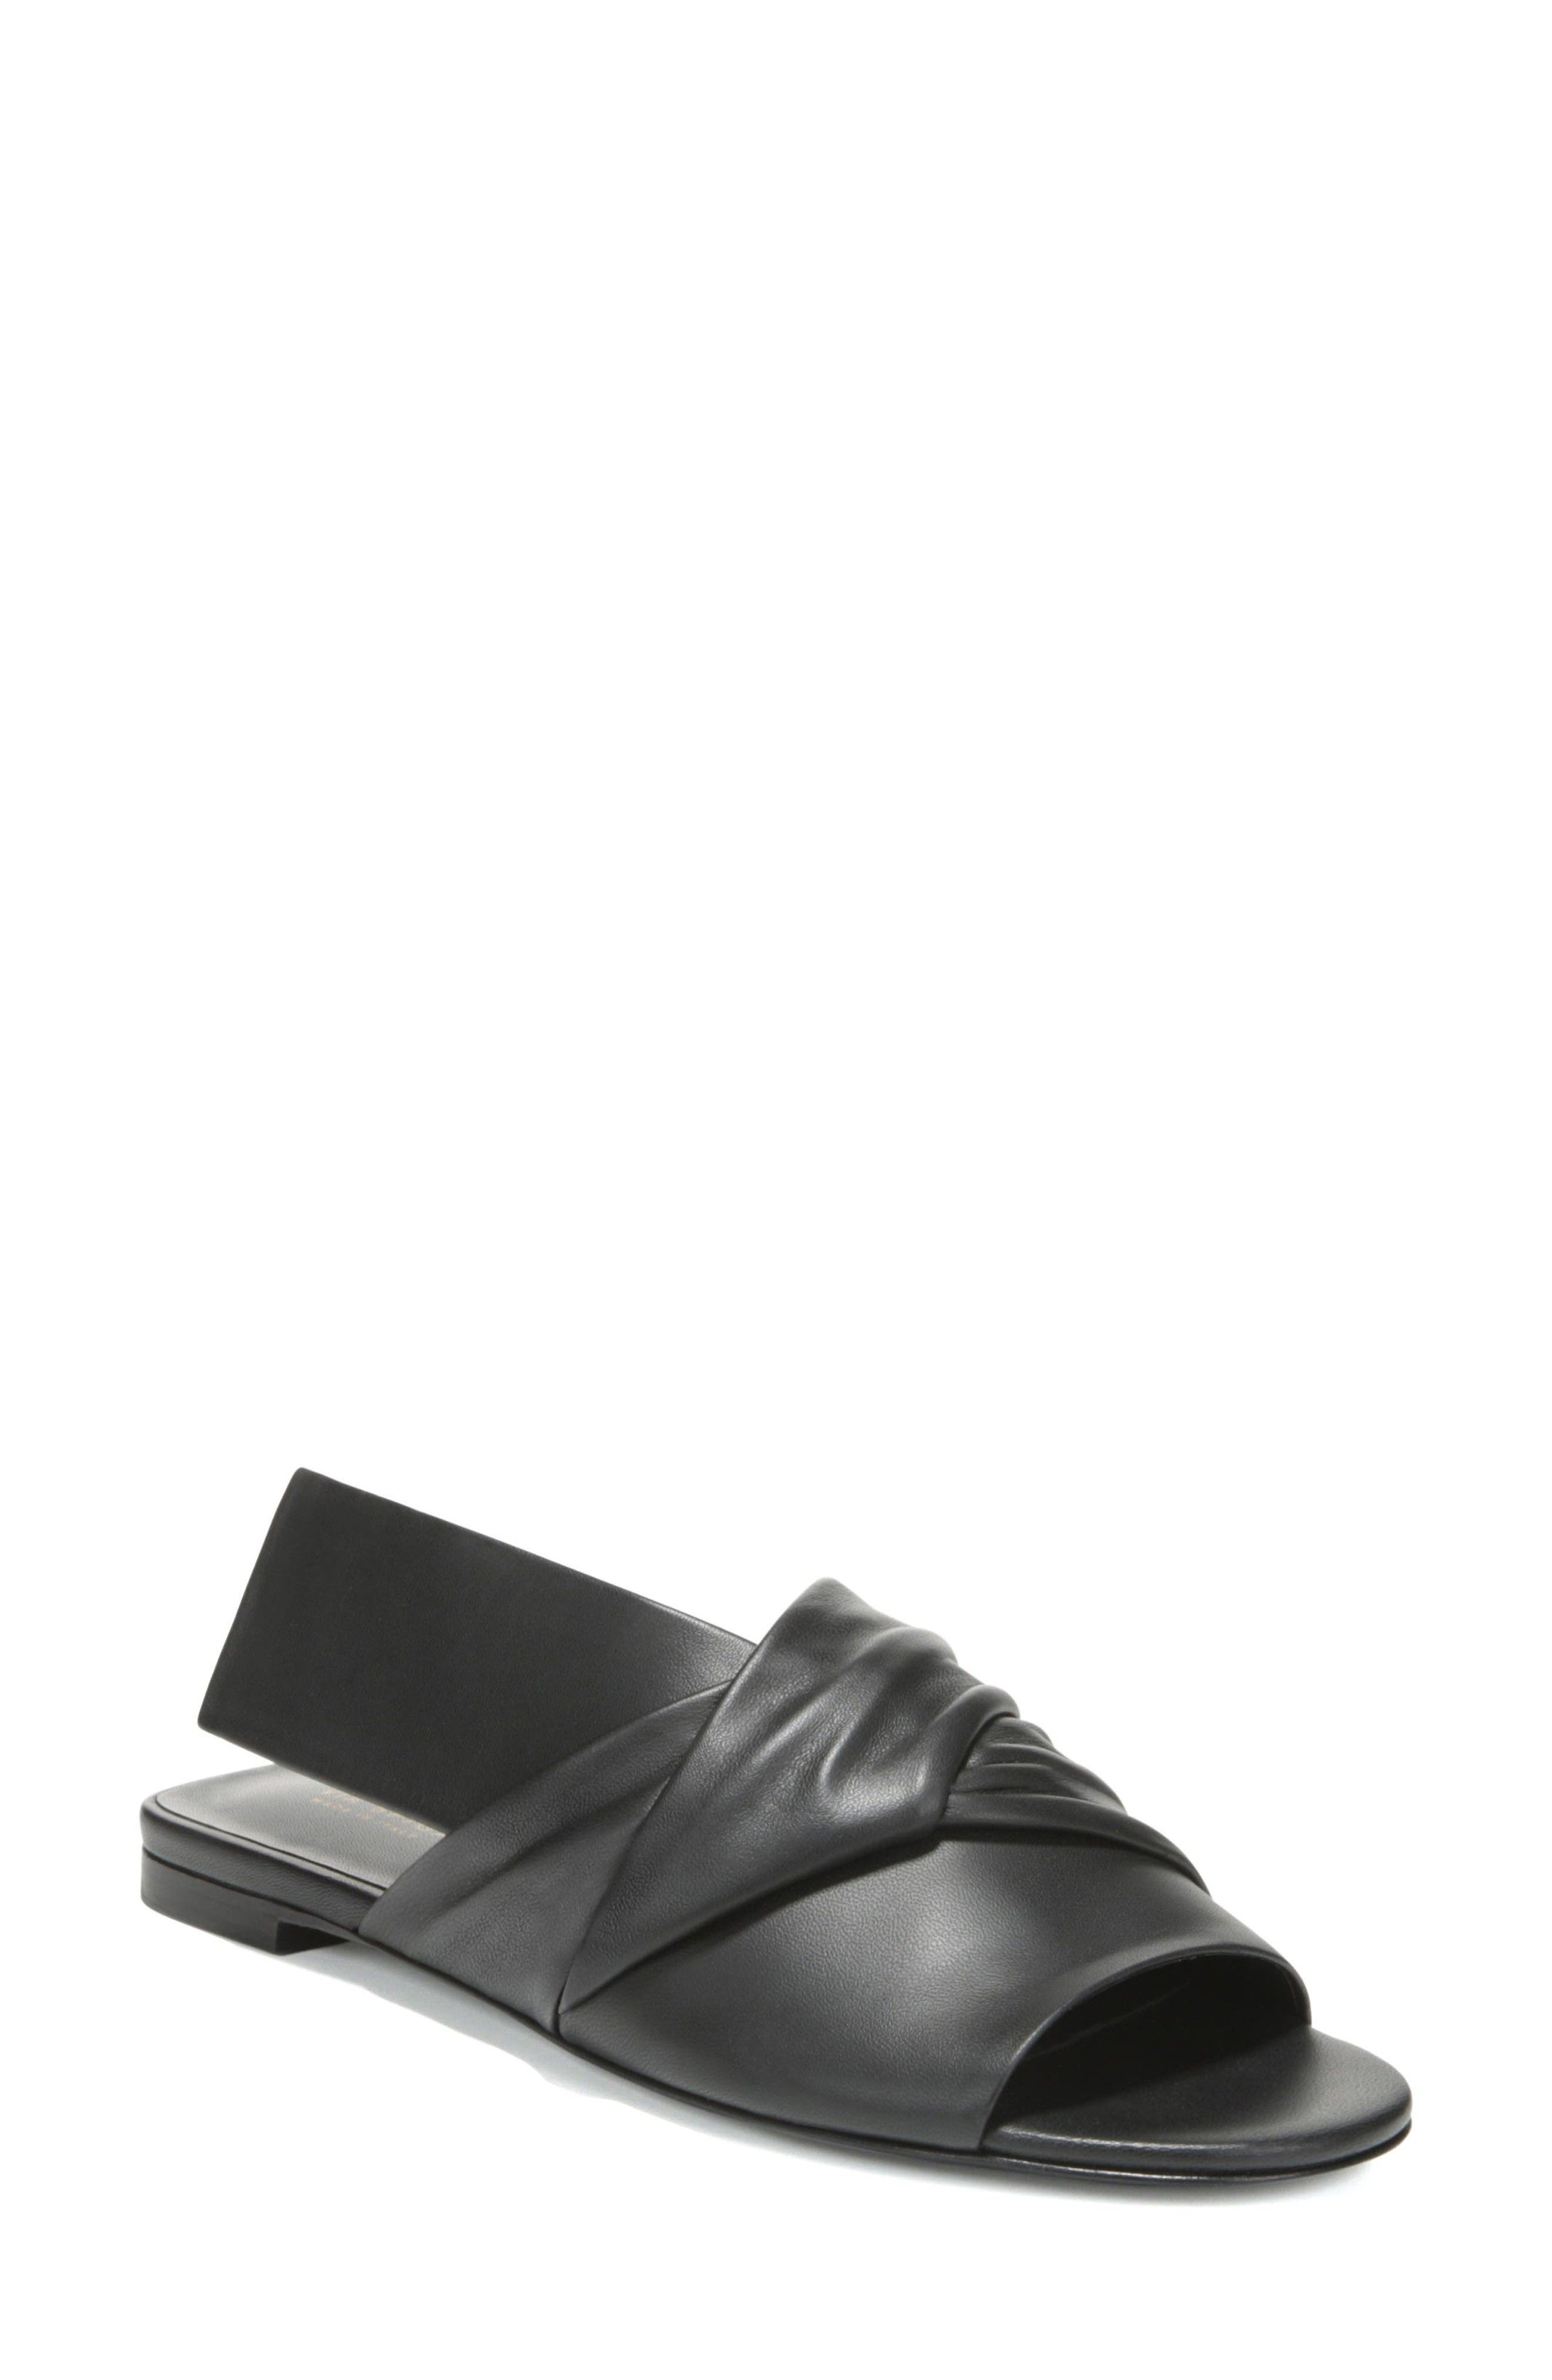 Halina Slide Sandal,                             Main thumbnail 1, color,                             BLACK LEATHER